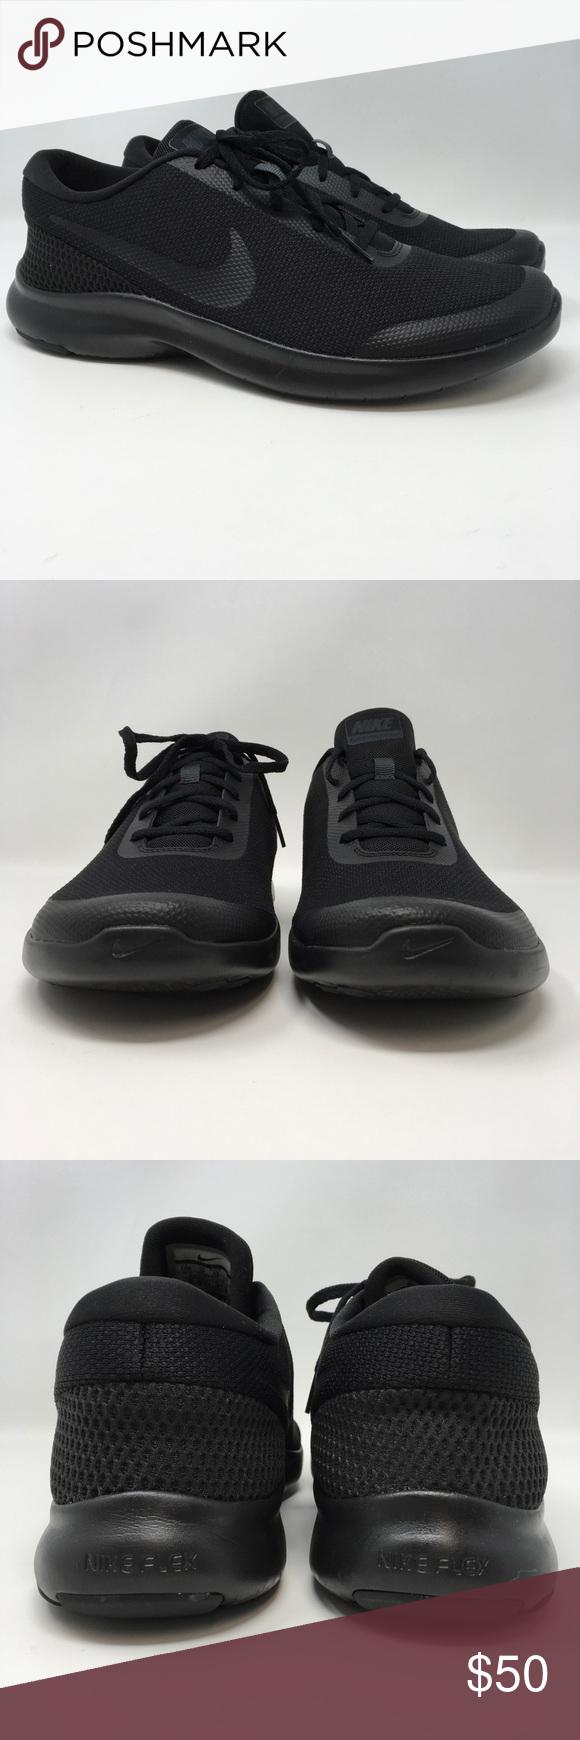 1b9f37746396c Nike Men s Running Shoes Flex Experience RN 7 4E Nike Mens Running Shoes  Flex Experience RN